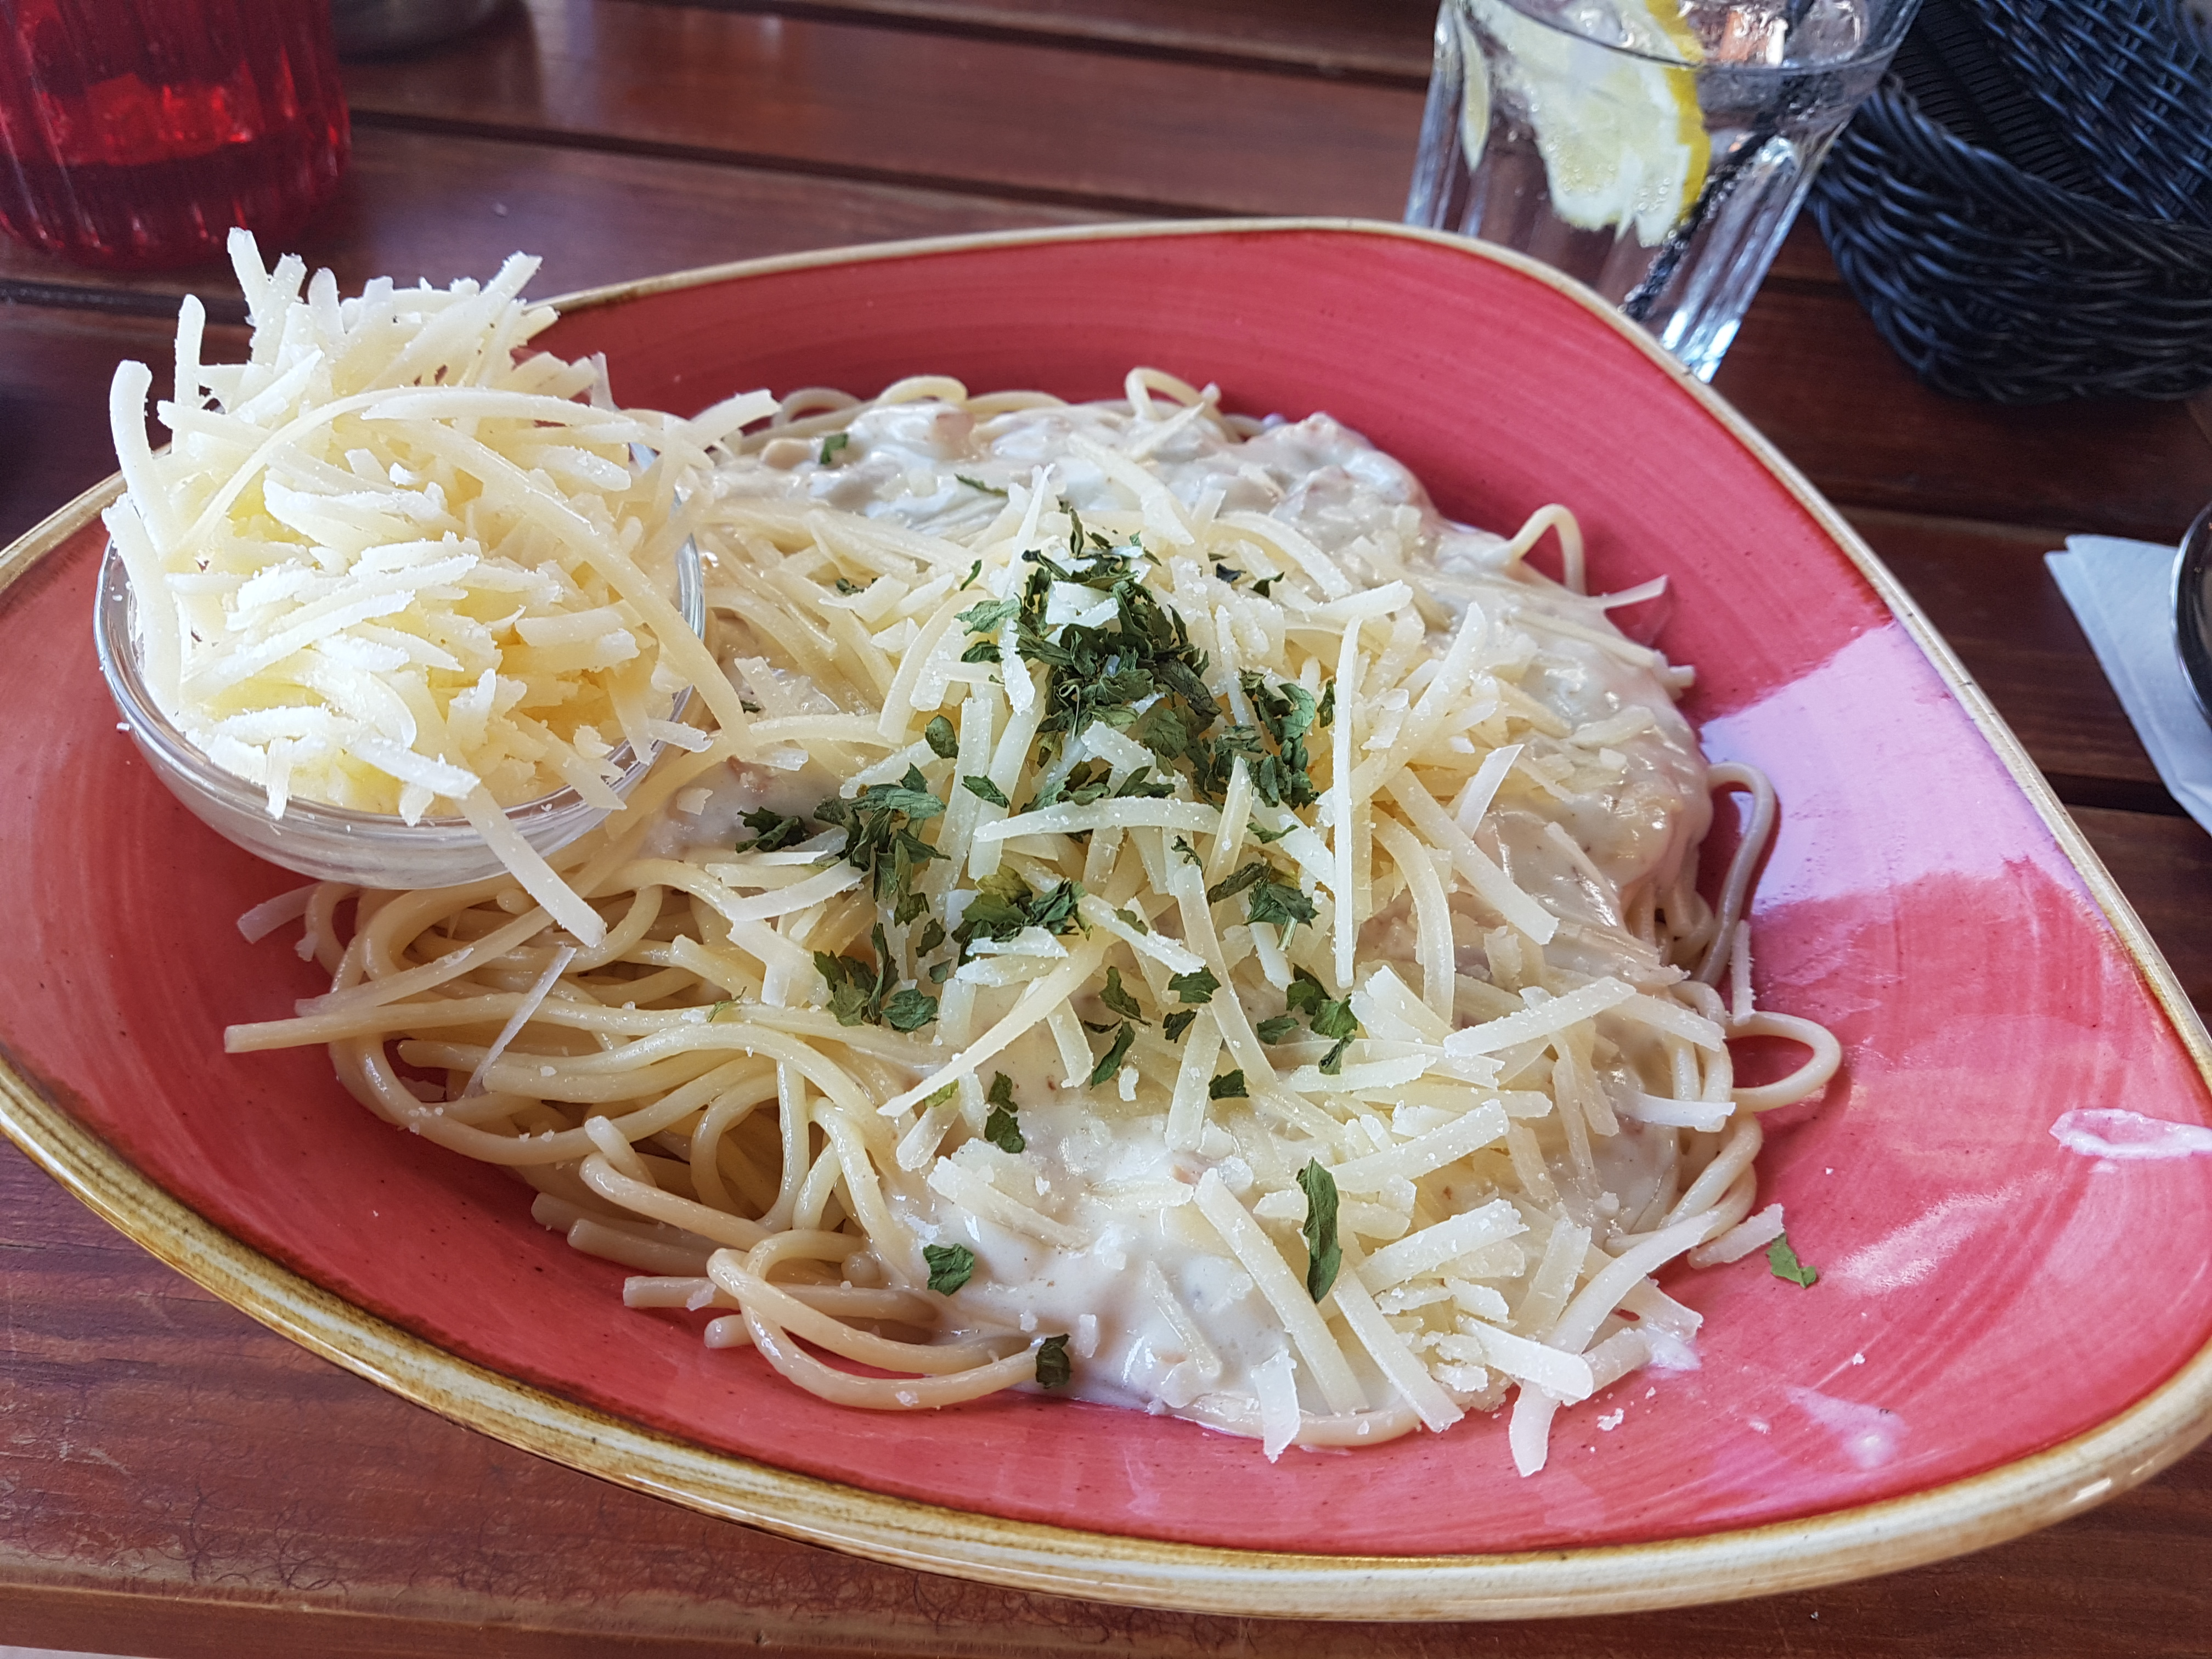 https://foodloader.net/Holz_2018-08-16_Spaghetti_Carbonara.jpg